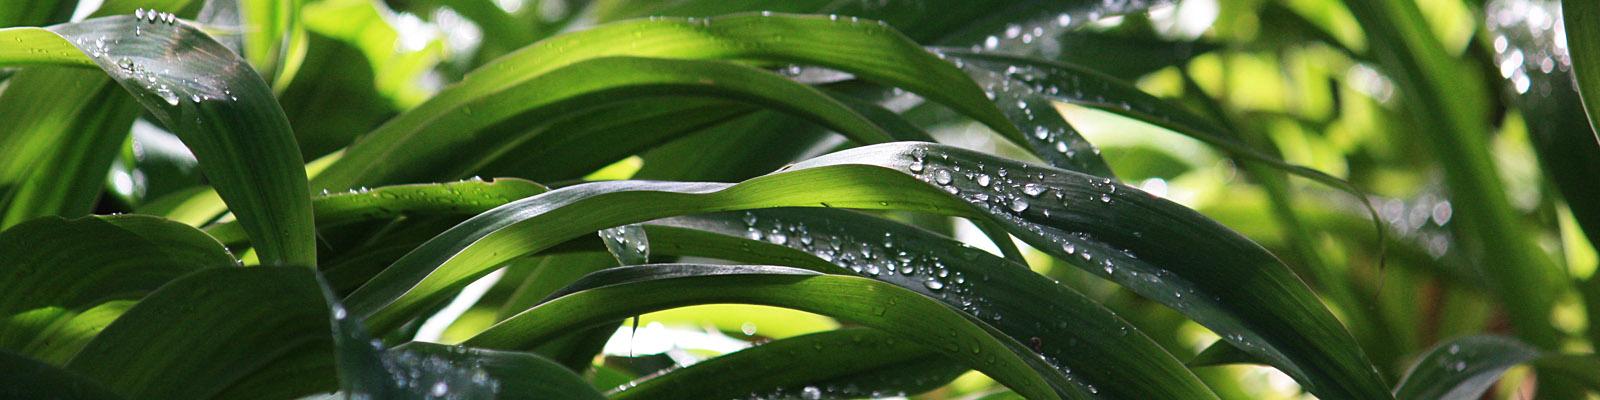 Green Parrot Gardens | Automatic Irrigation| Drip Irrigation